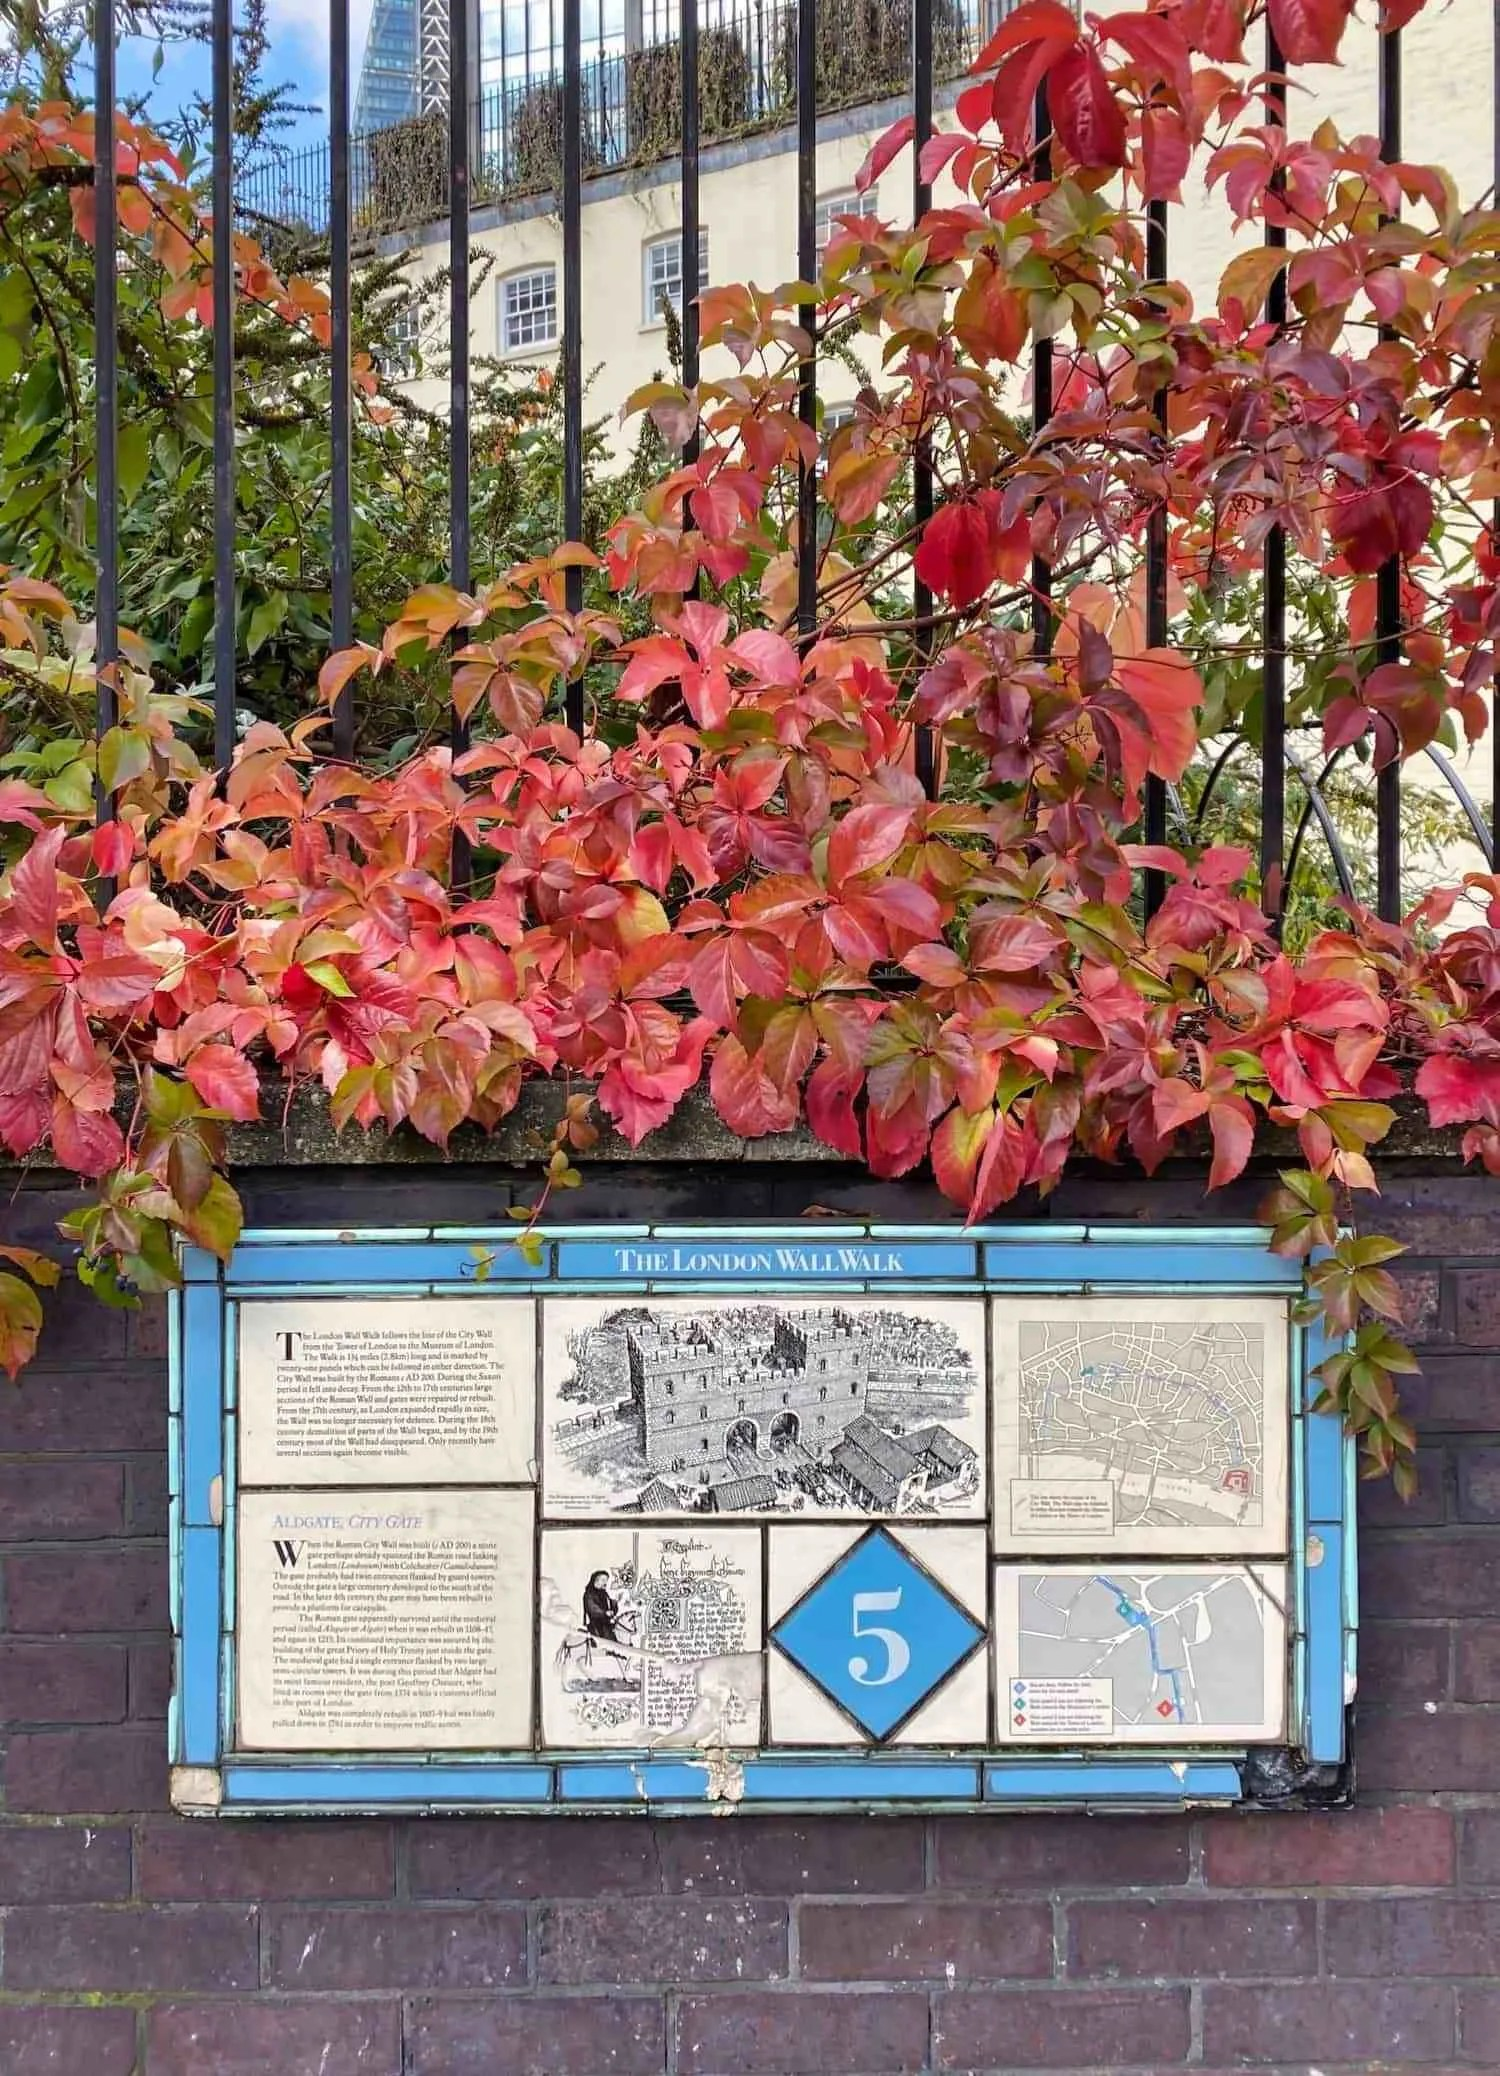 London Wall Walk - Plaque 5